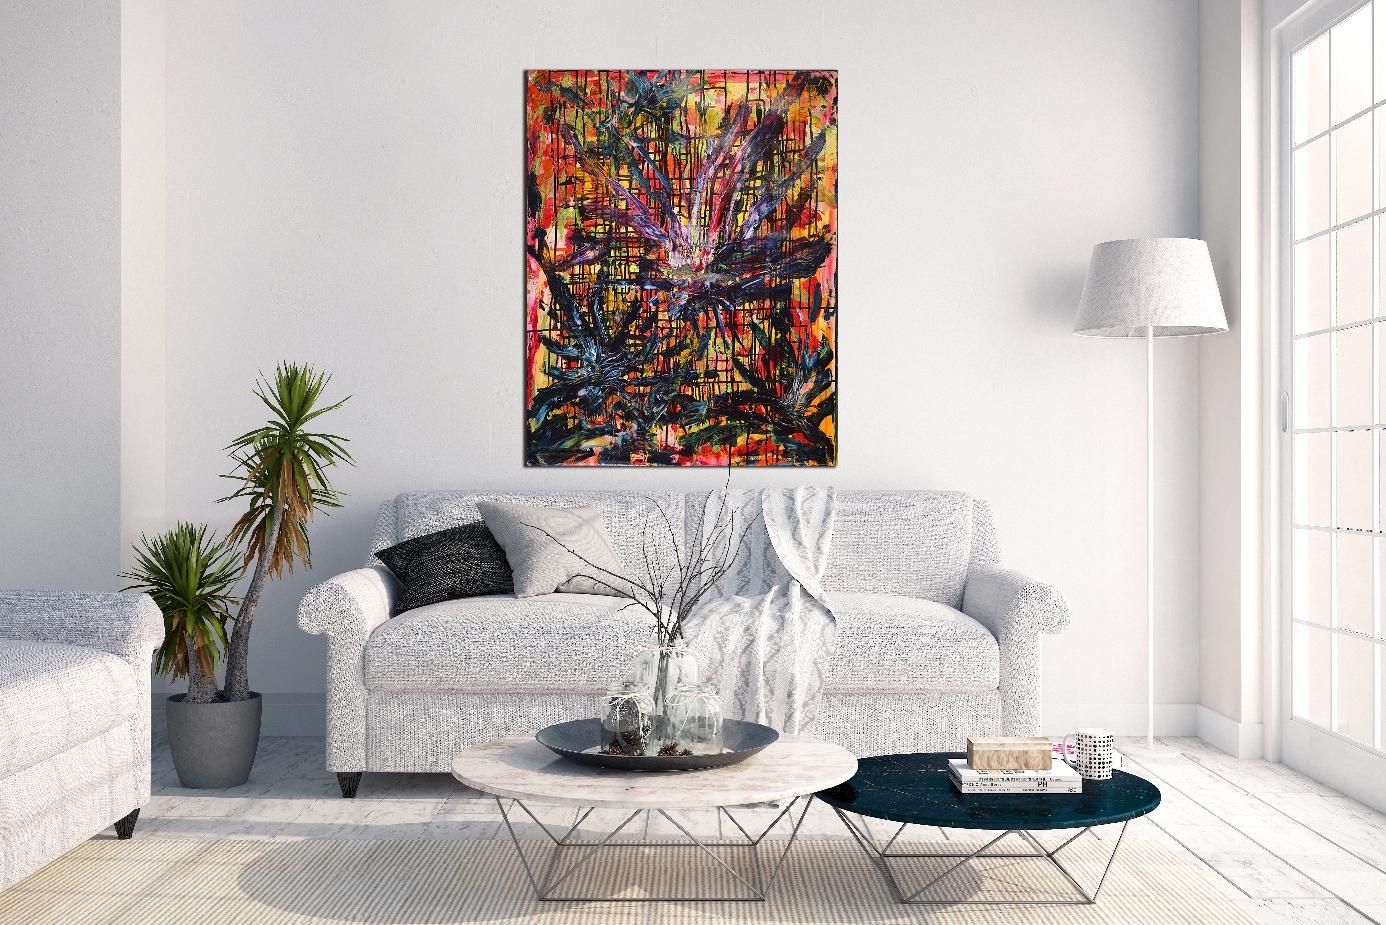 Color Whiplash by Nestor Toro - Rare early work!